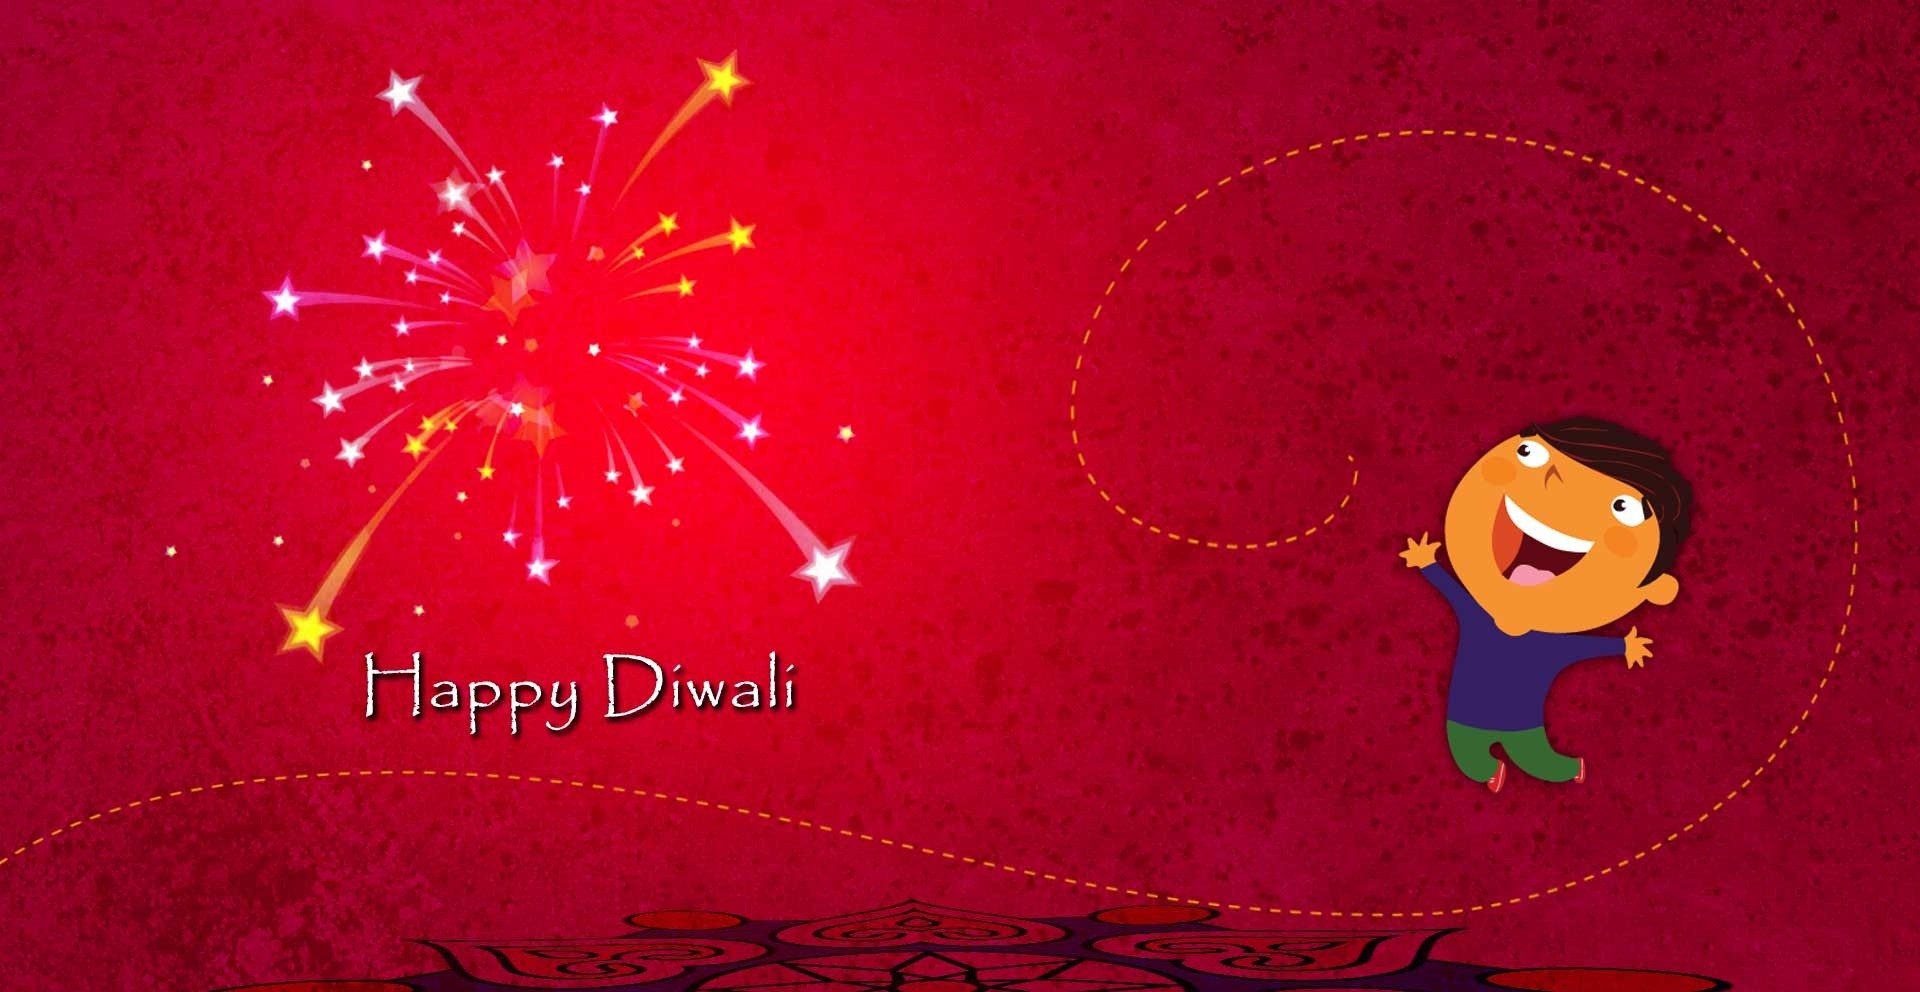 Happy Diwali Cartoon, Funny, Firework MP4 & GIF Videos for Whatsapp & Facebook 2021